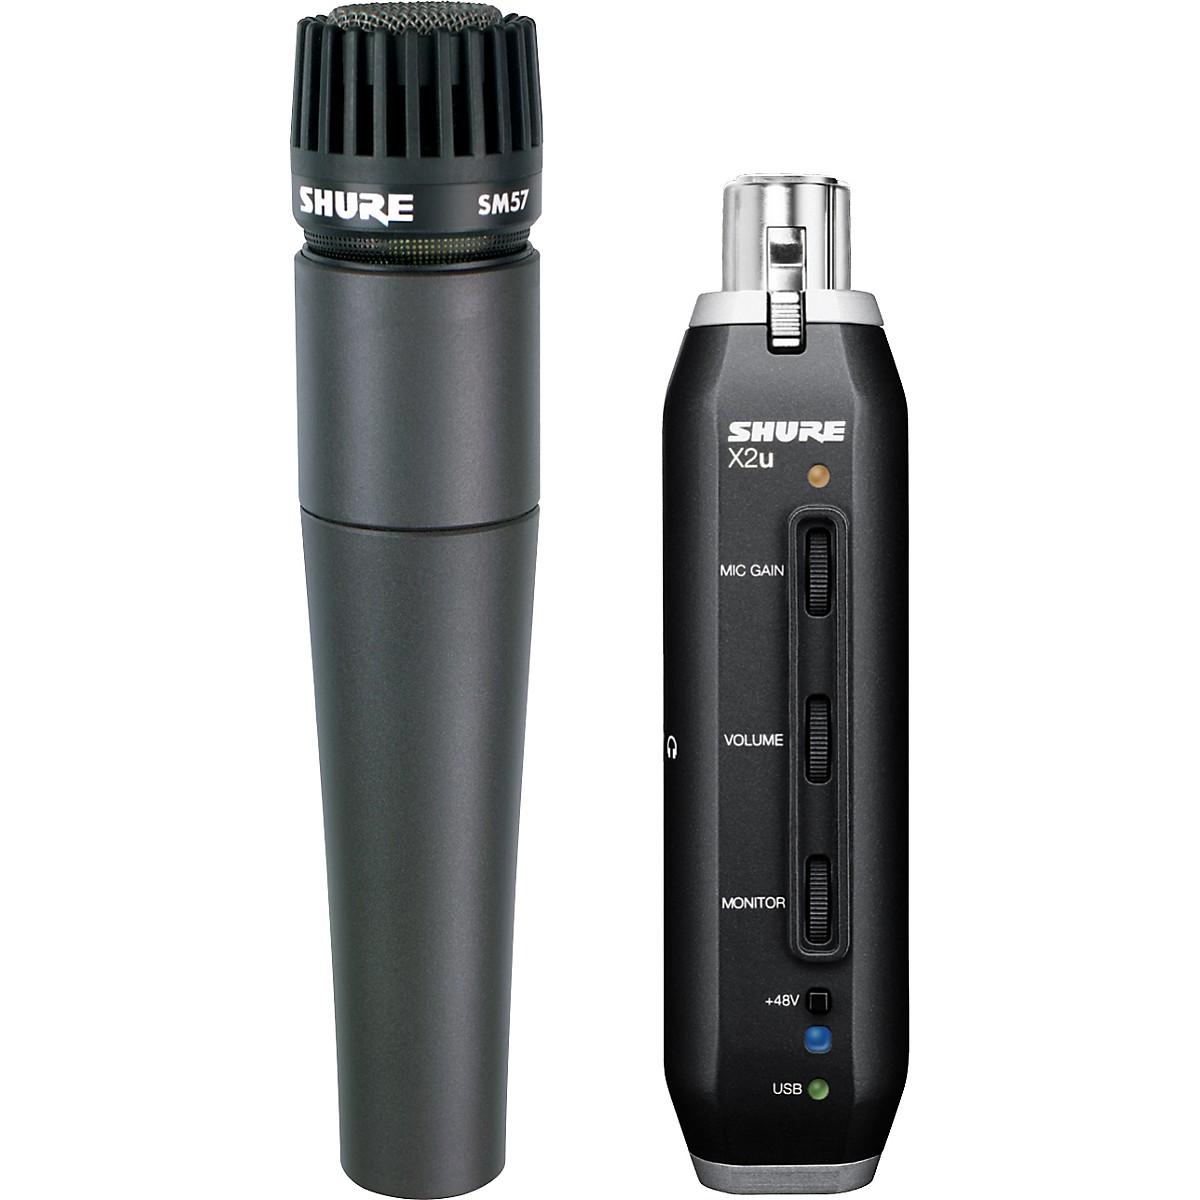 Shure SM57-X2U SM57 MIC WITH XLR-TO-USB PACKAGE